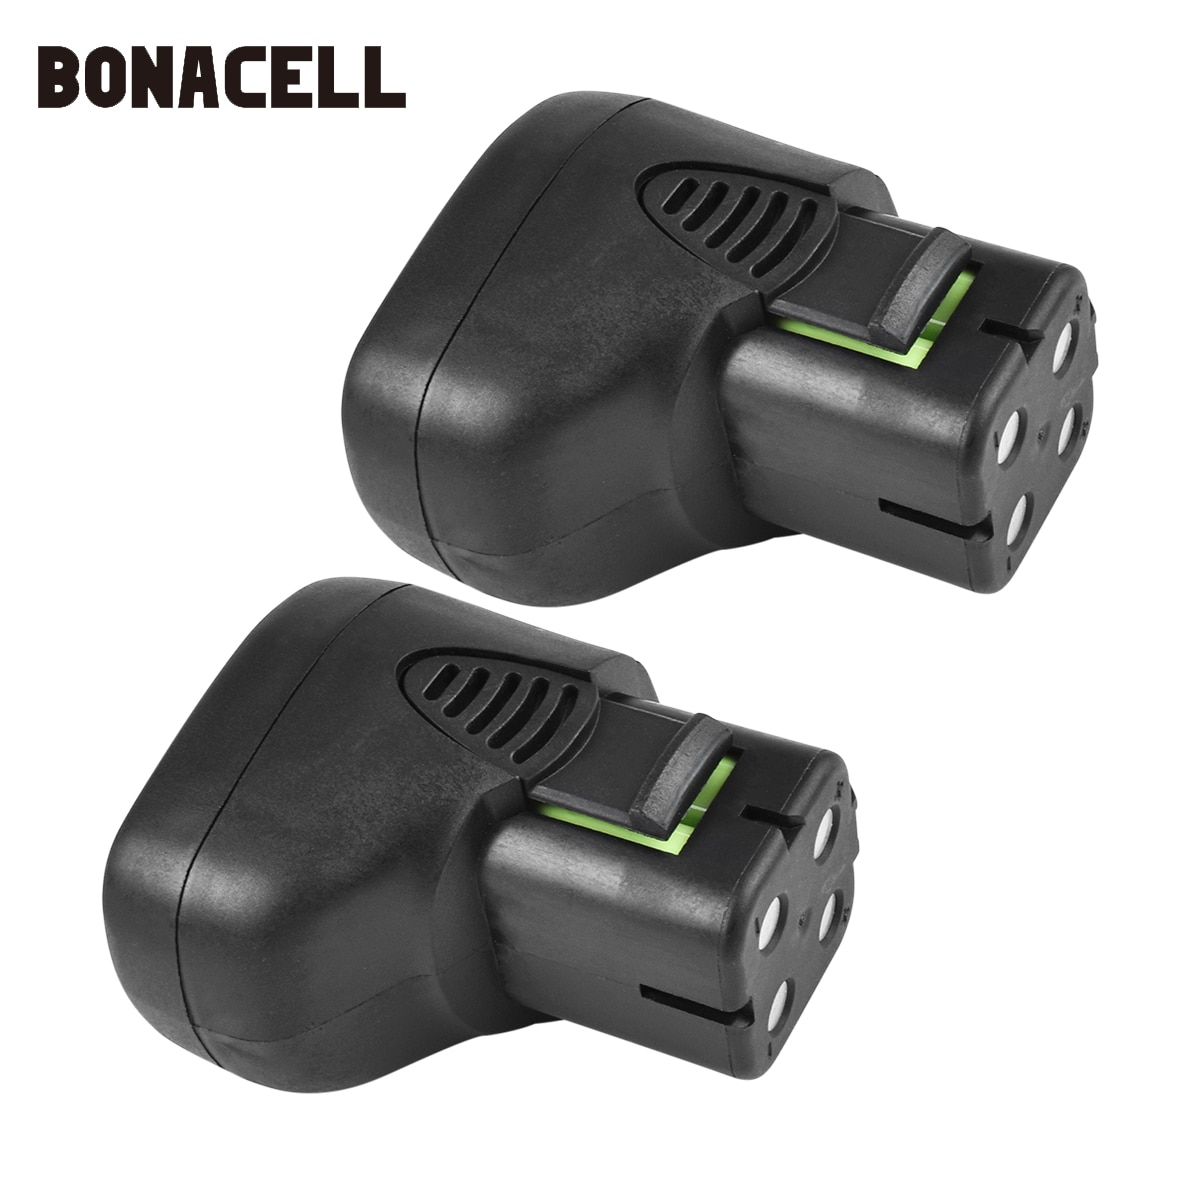 Bonacell Hohe Qualität 7,2 V 3000mAh NI-MH Ersatz Batterie Pack Für Dremel 757-01 7700-01 7700-02 L10